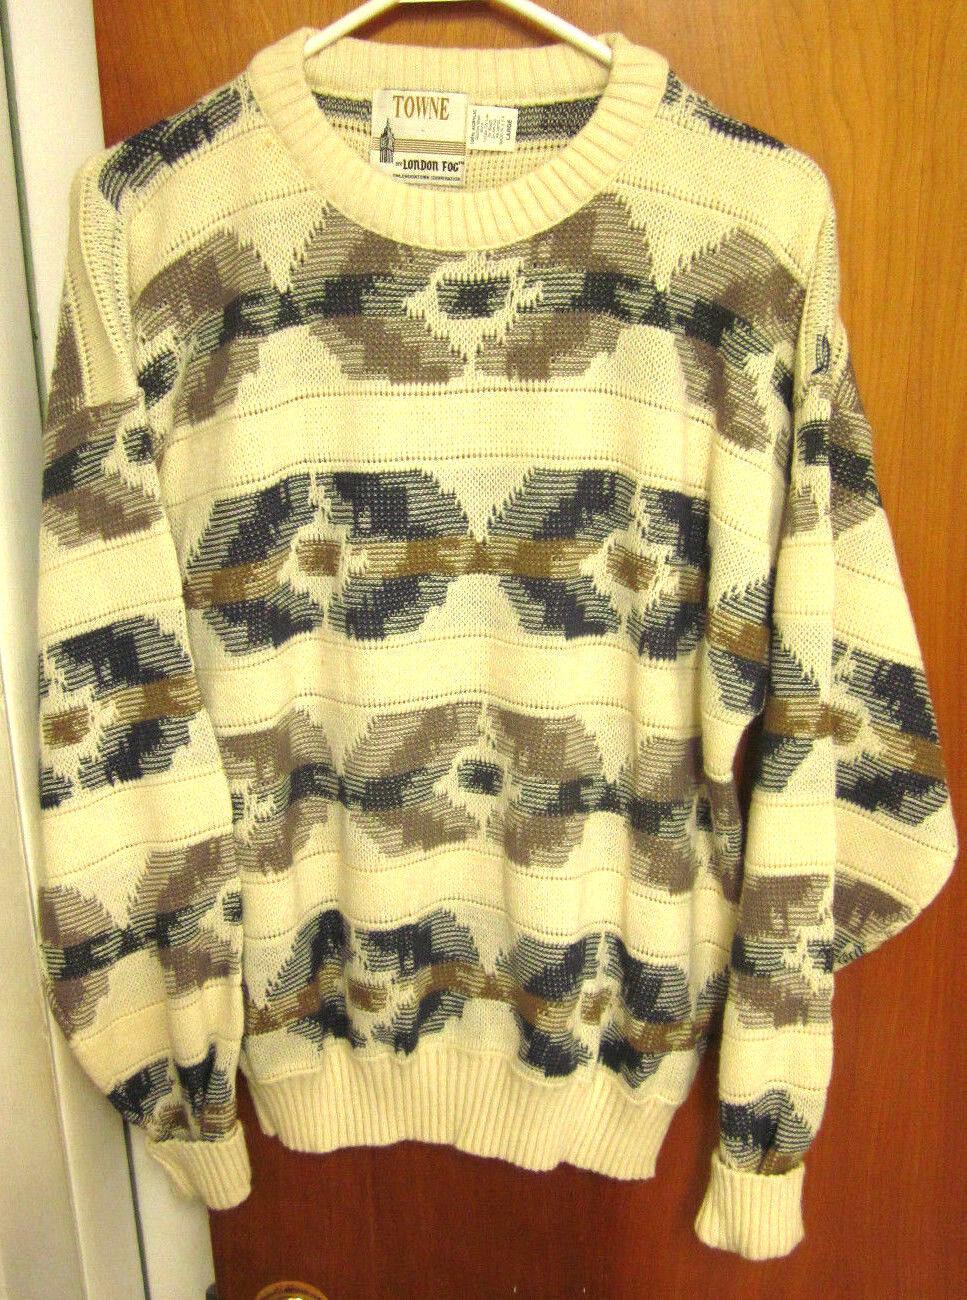 LONDON FOG ectoplasm cream lrg knit sweater Towne microwave ghost-hunter 1980s